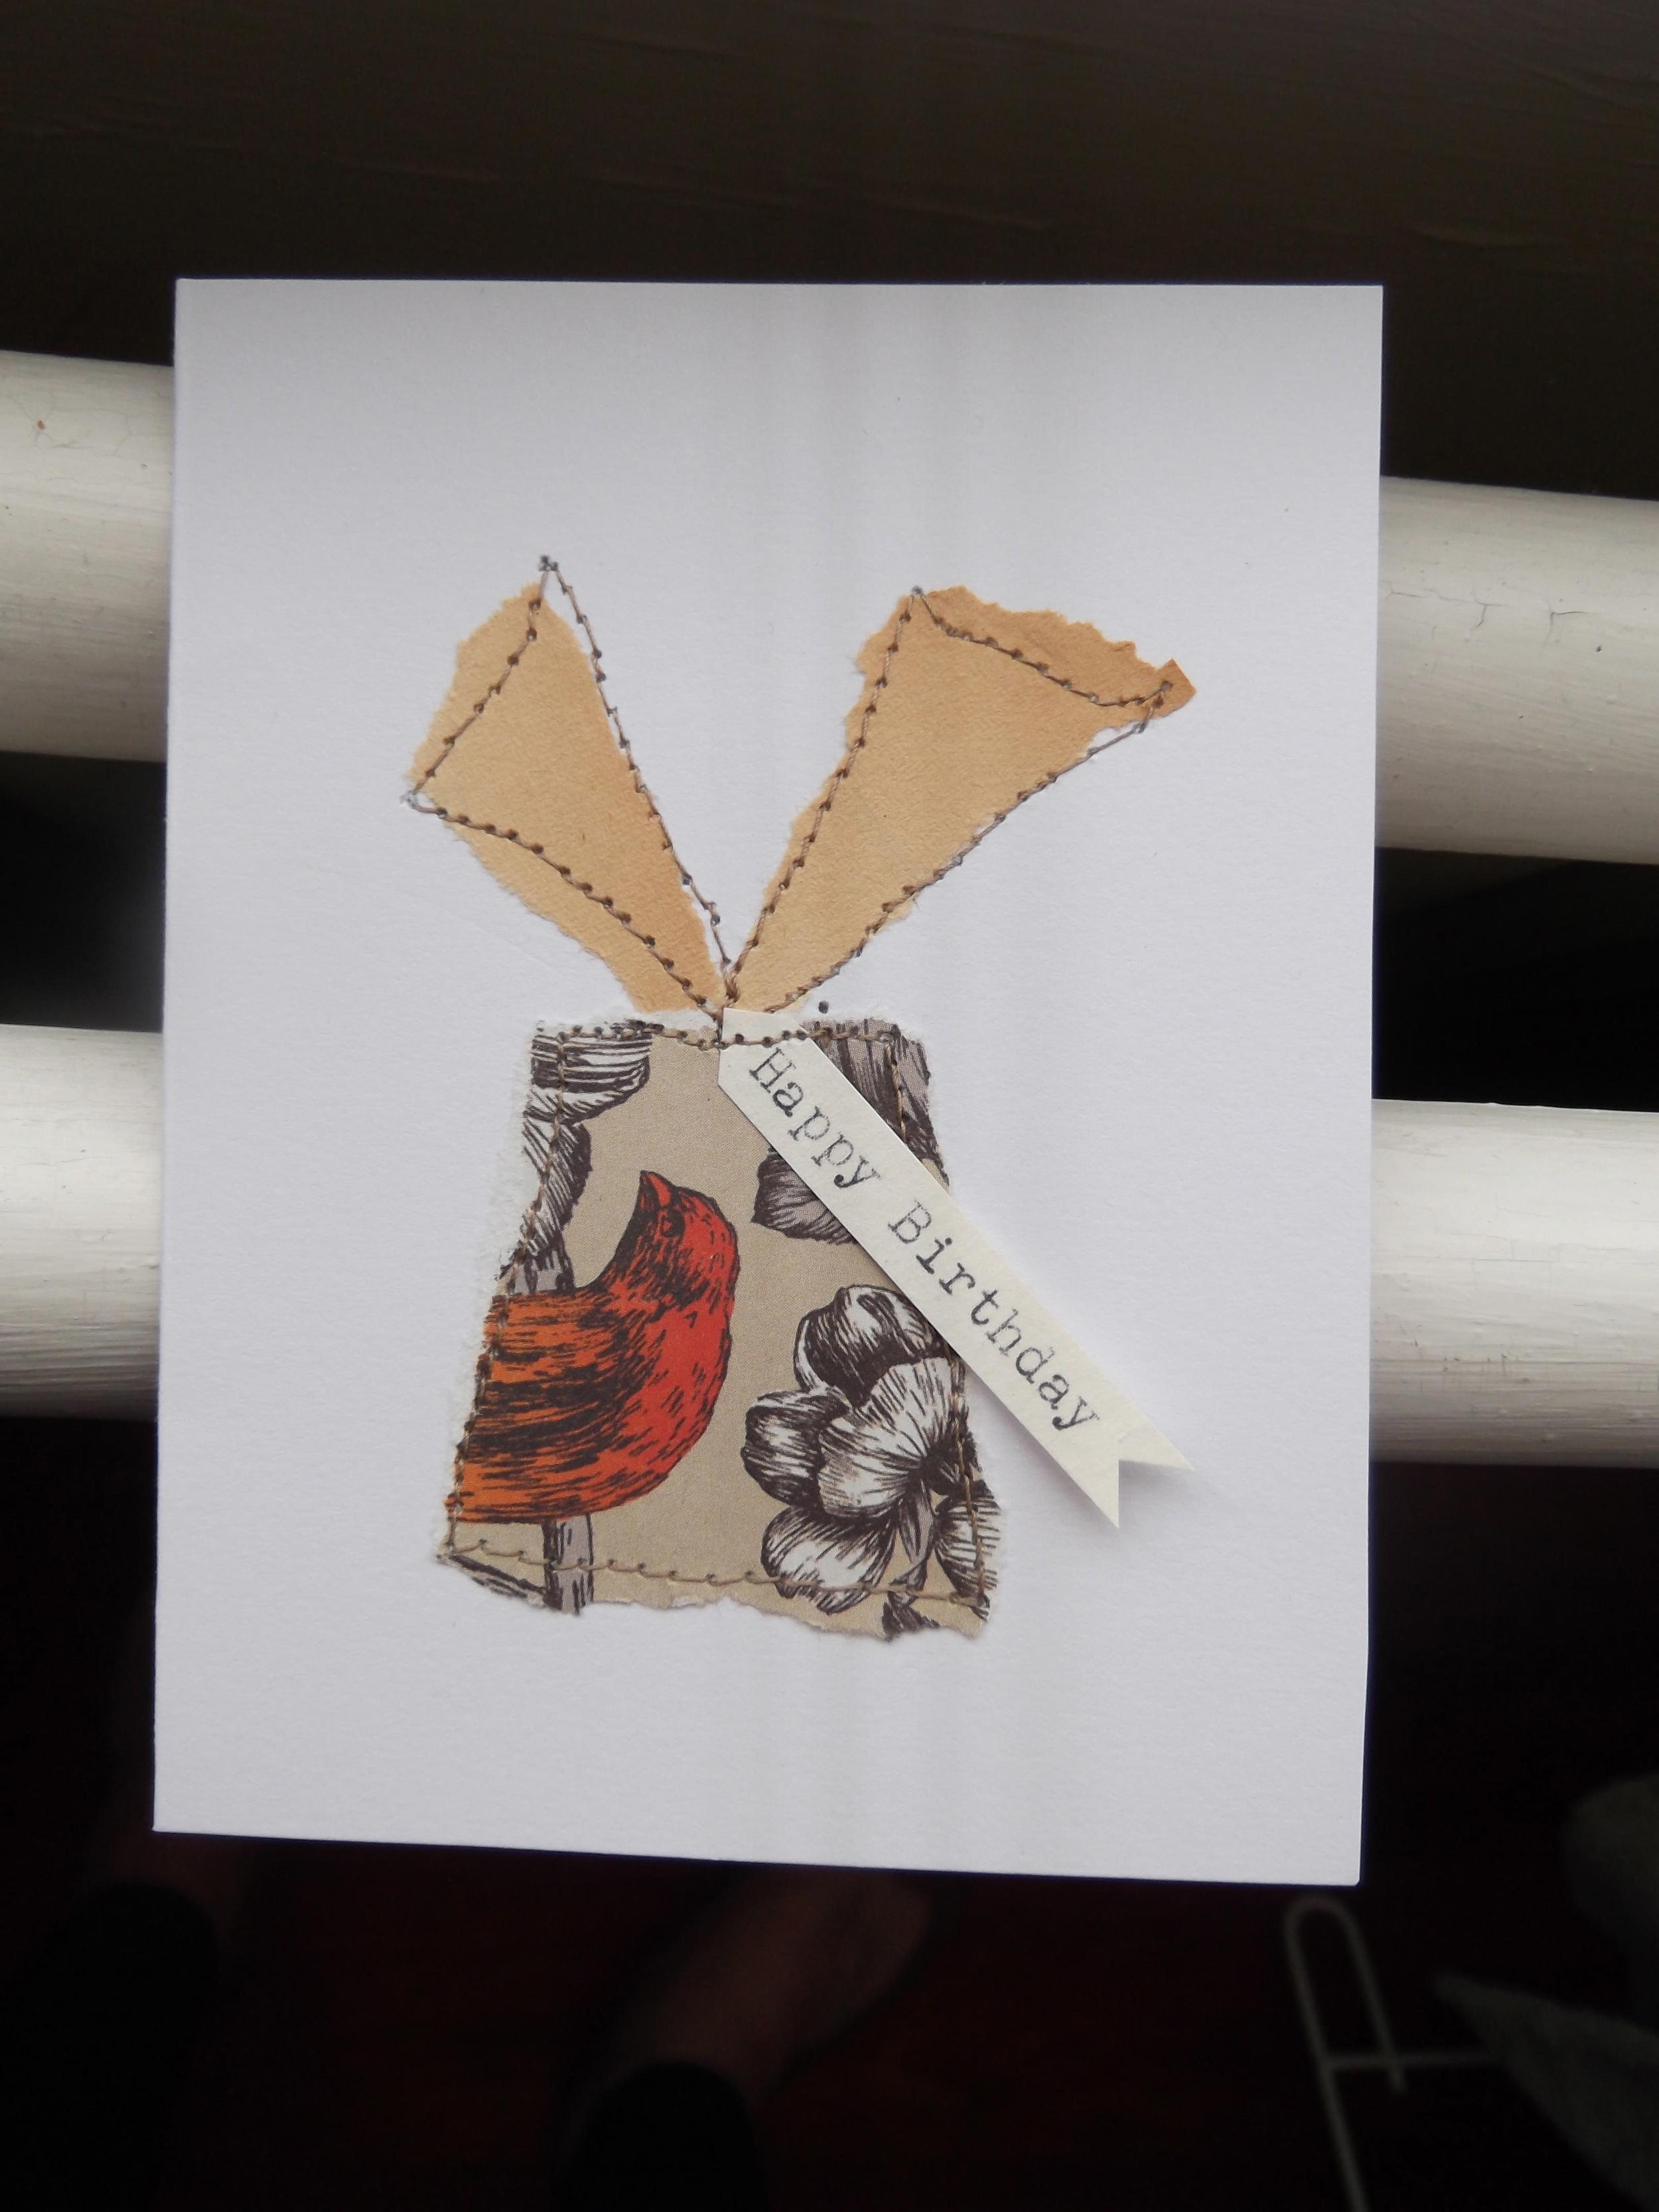 4Birthday_Card_personalised_bespoke_design_and _message.JPG